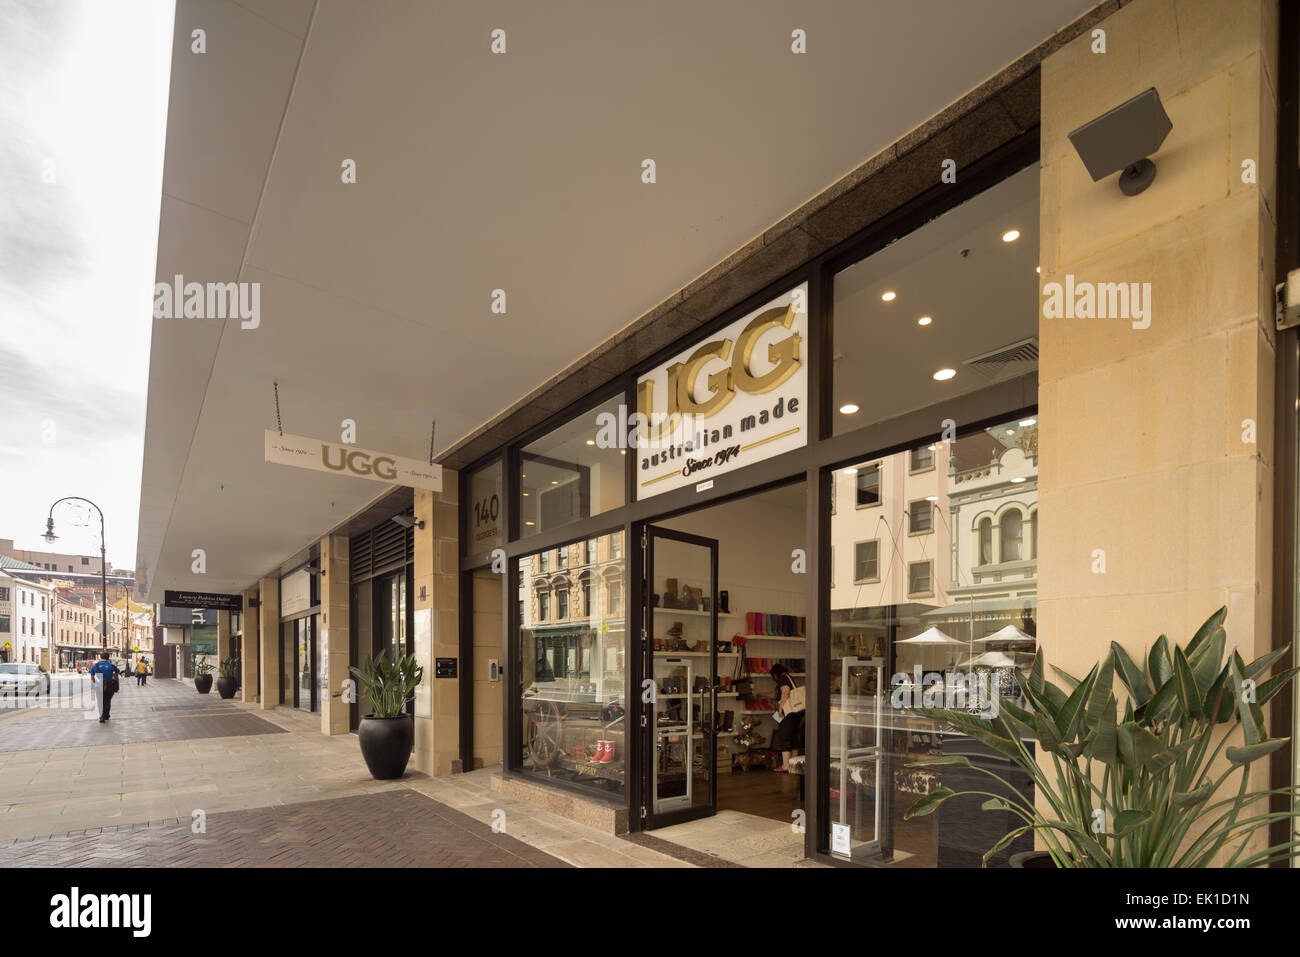 ugg store in sydney